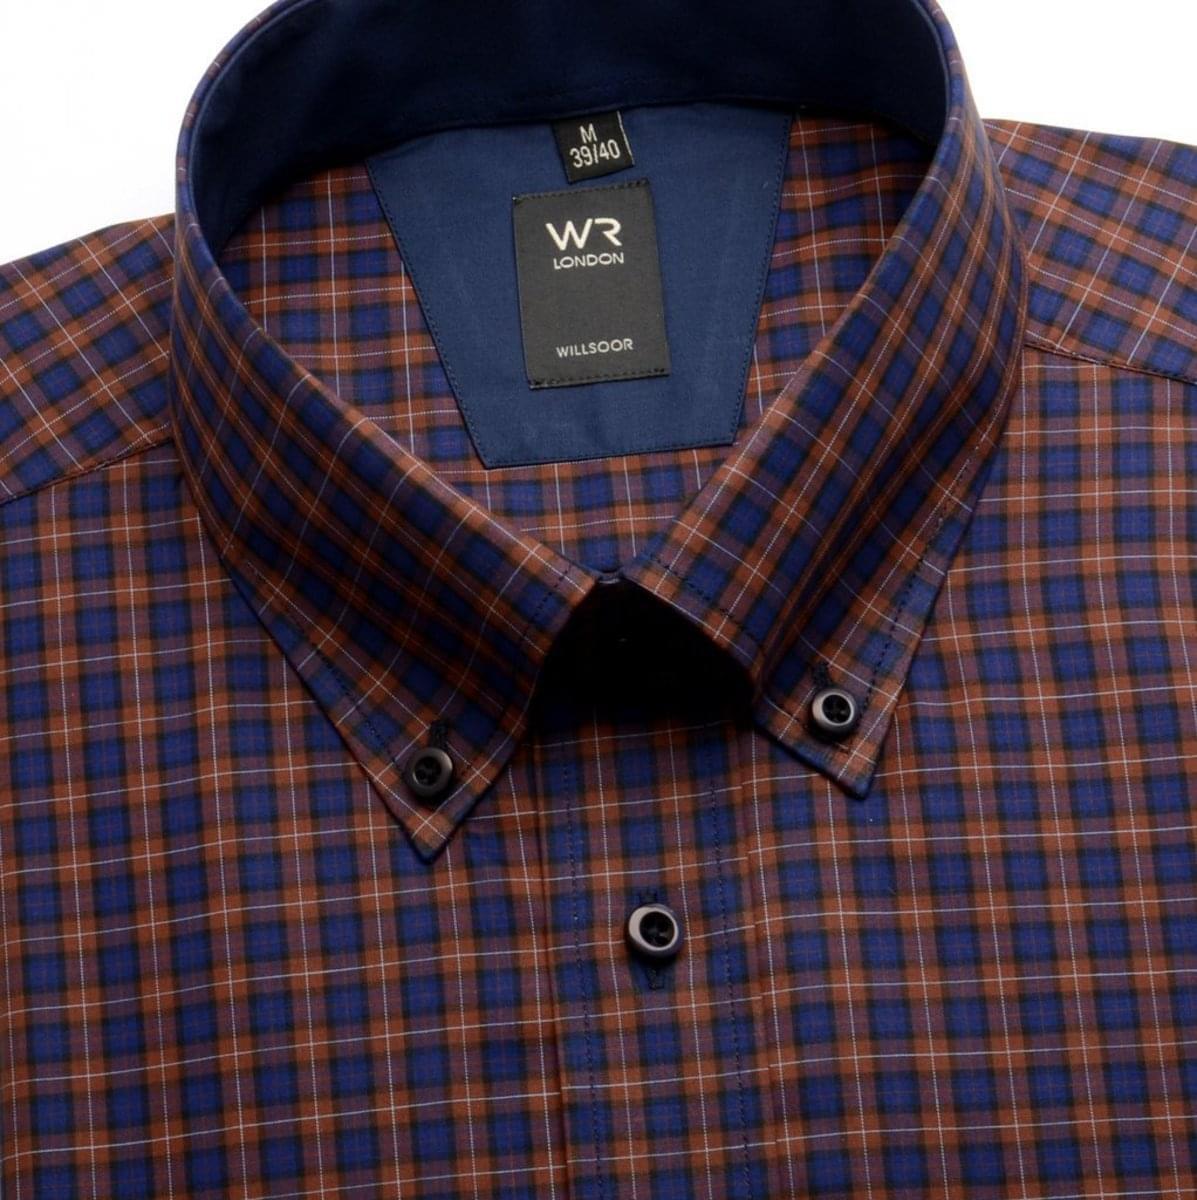 Willsoor Pánska košeľa WR London (výška 164-170) 1628 164-170 / L (41/42)